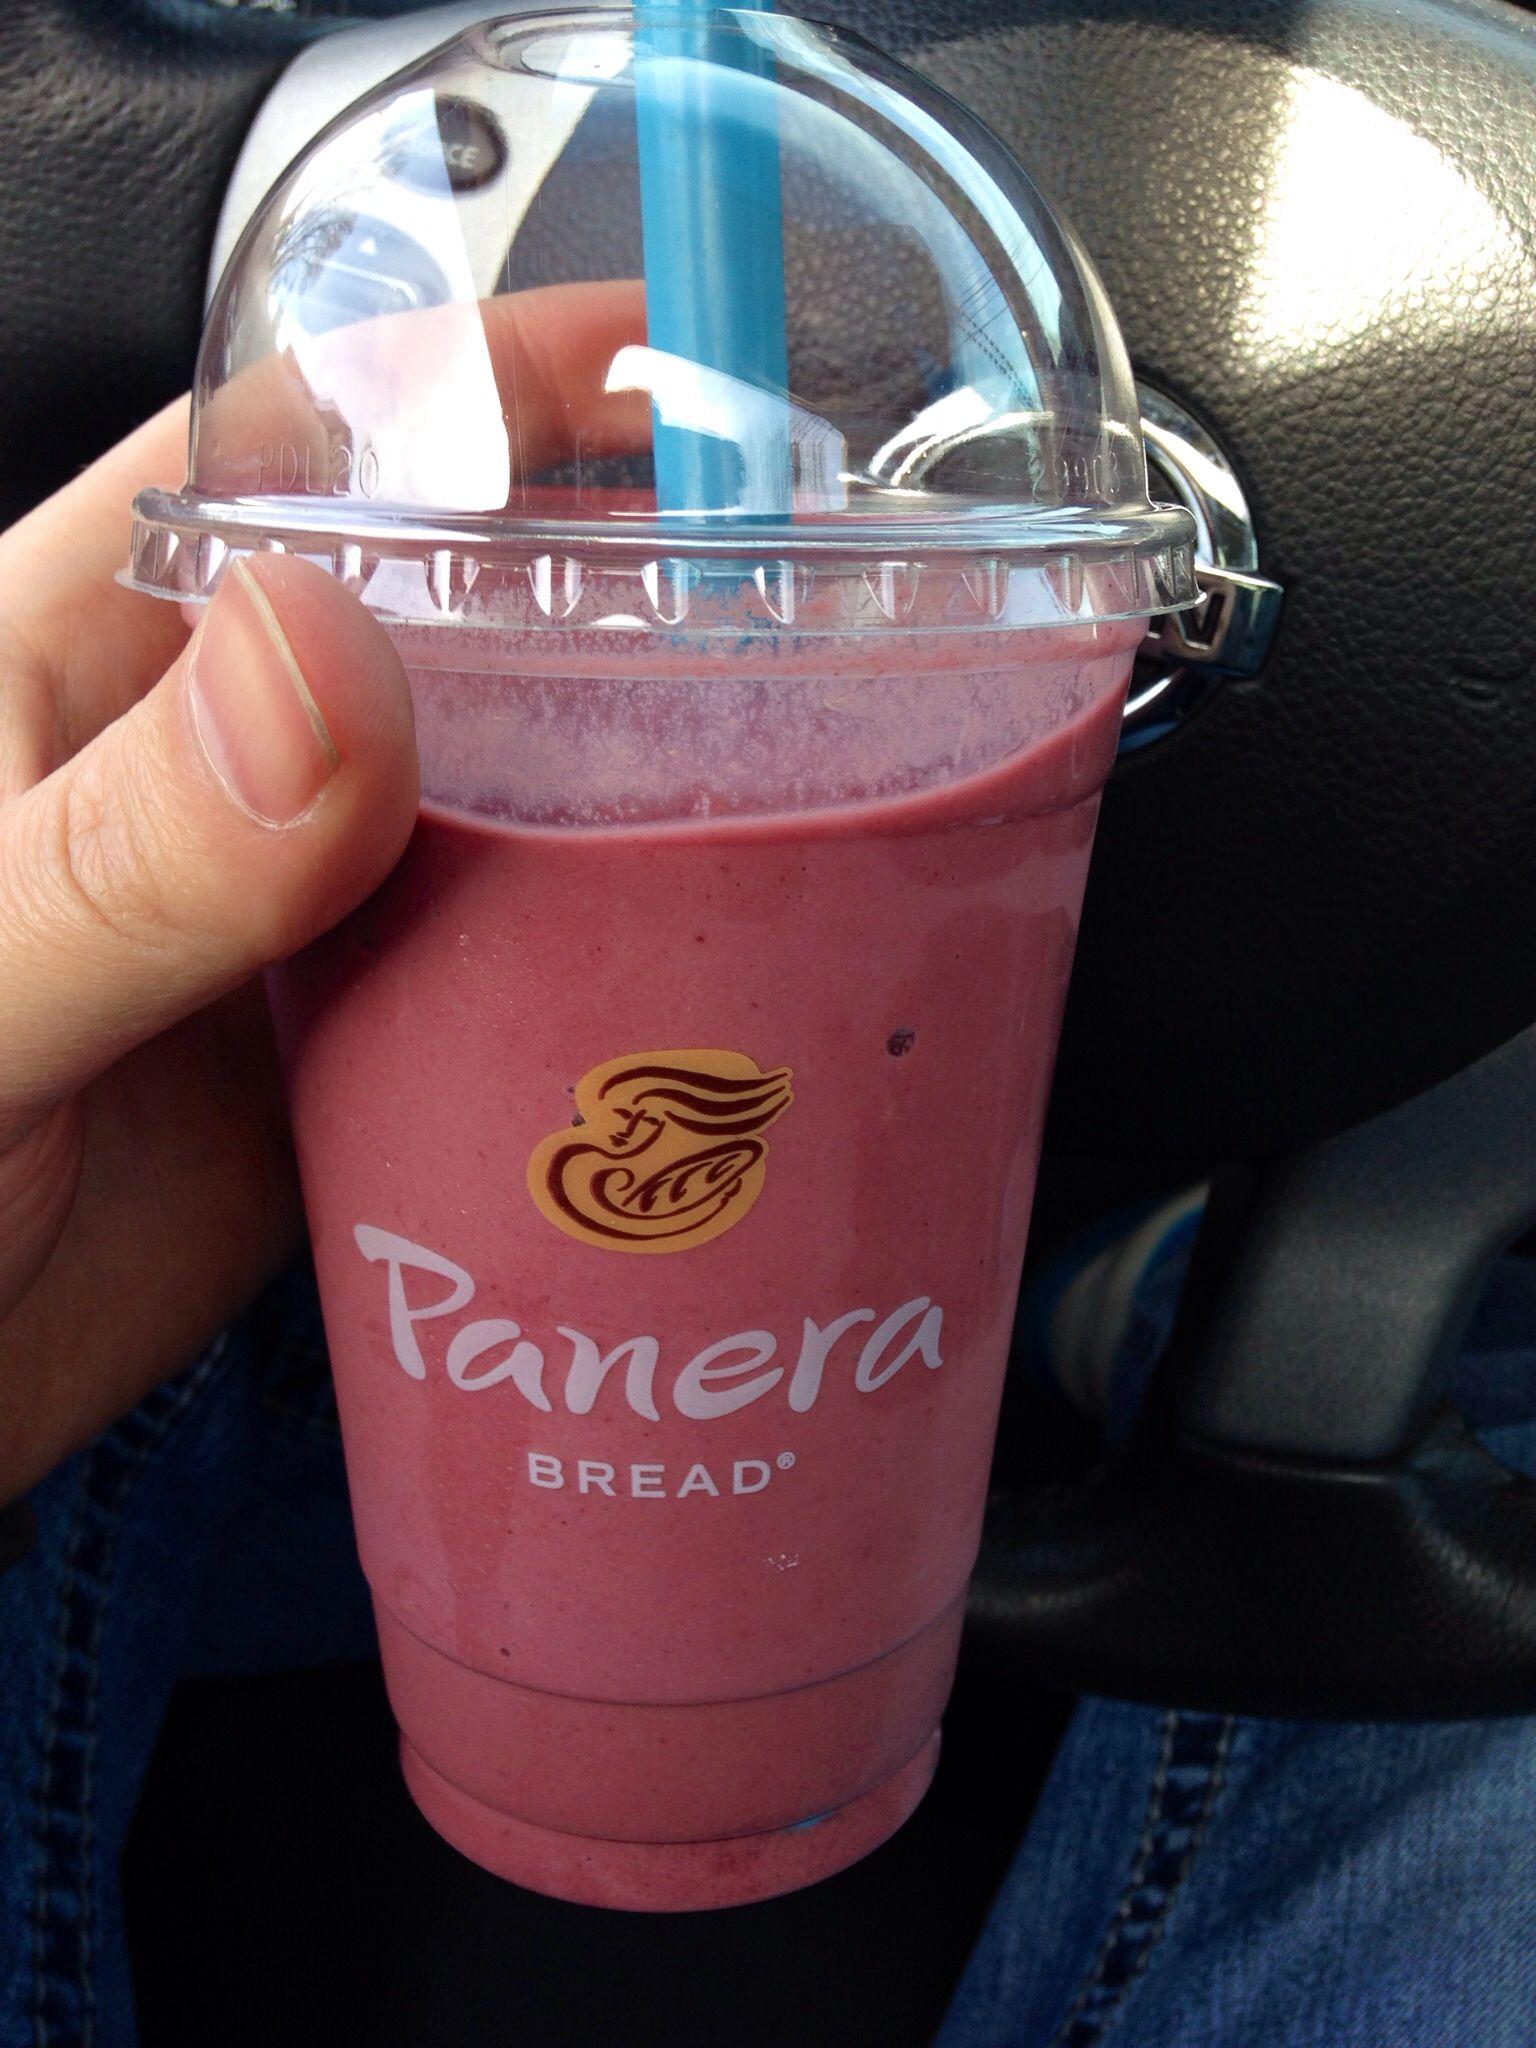 Super fruit Power Smoothie Panera. My favorite drink